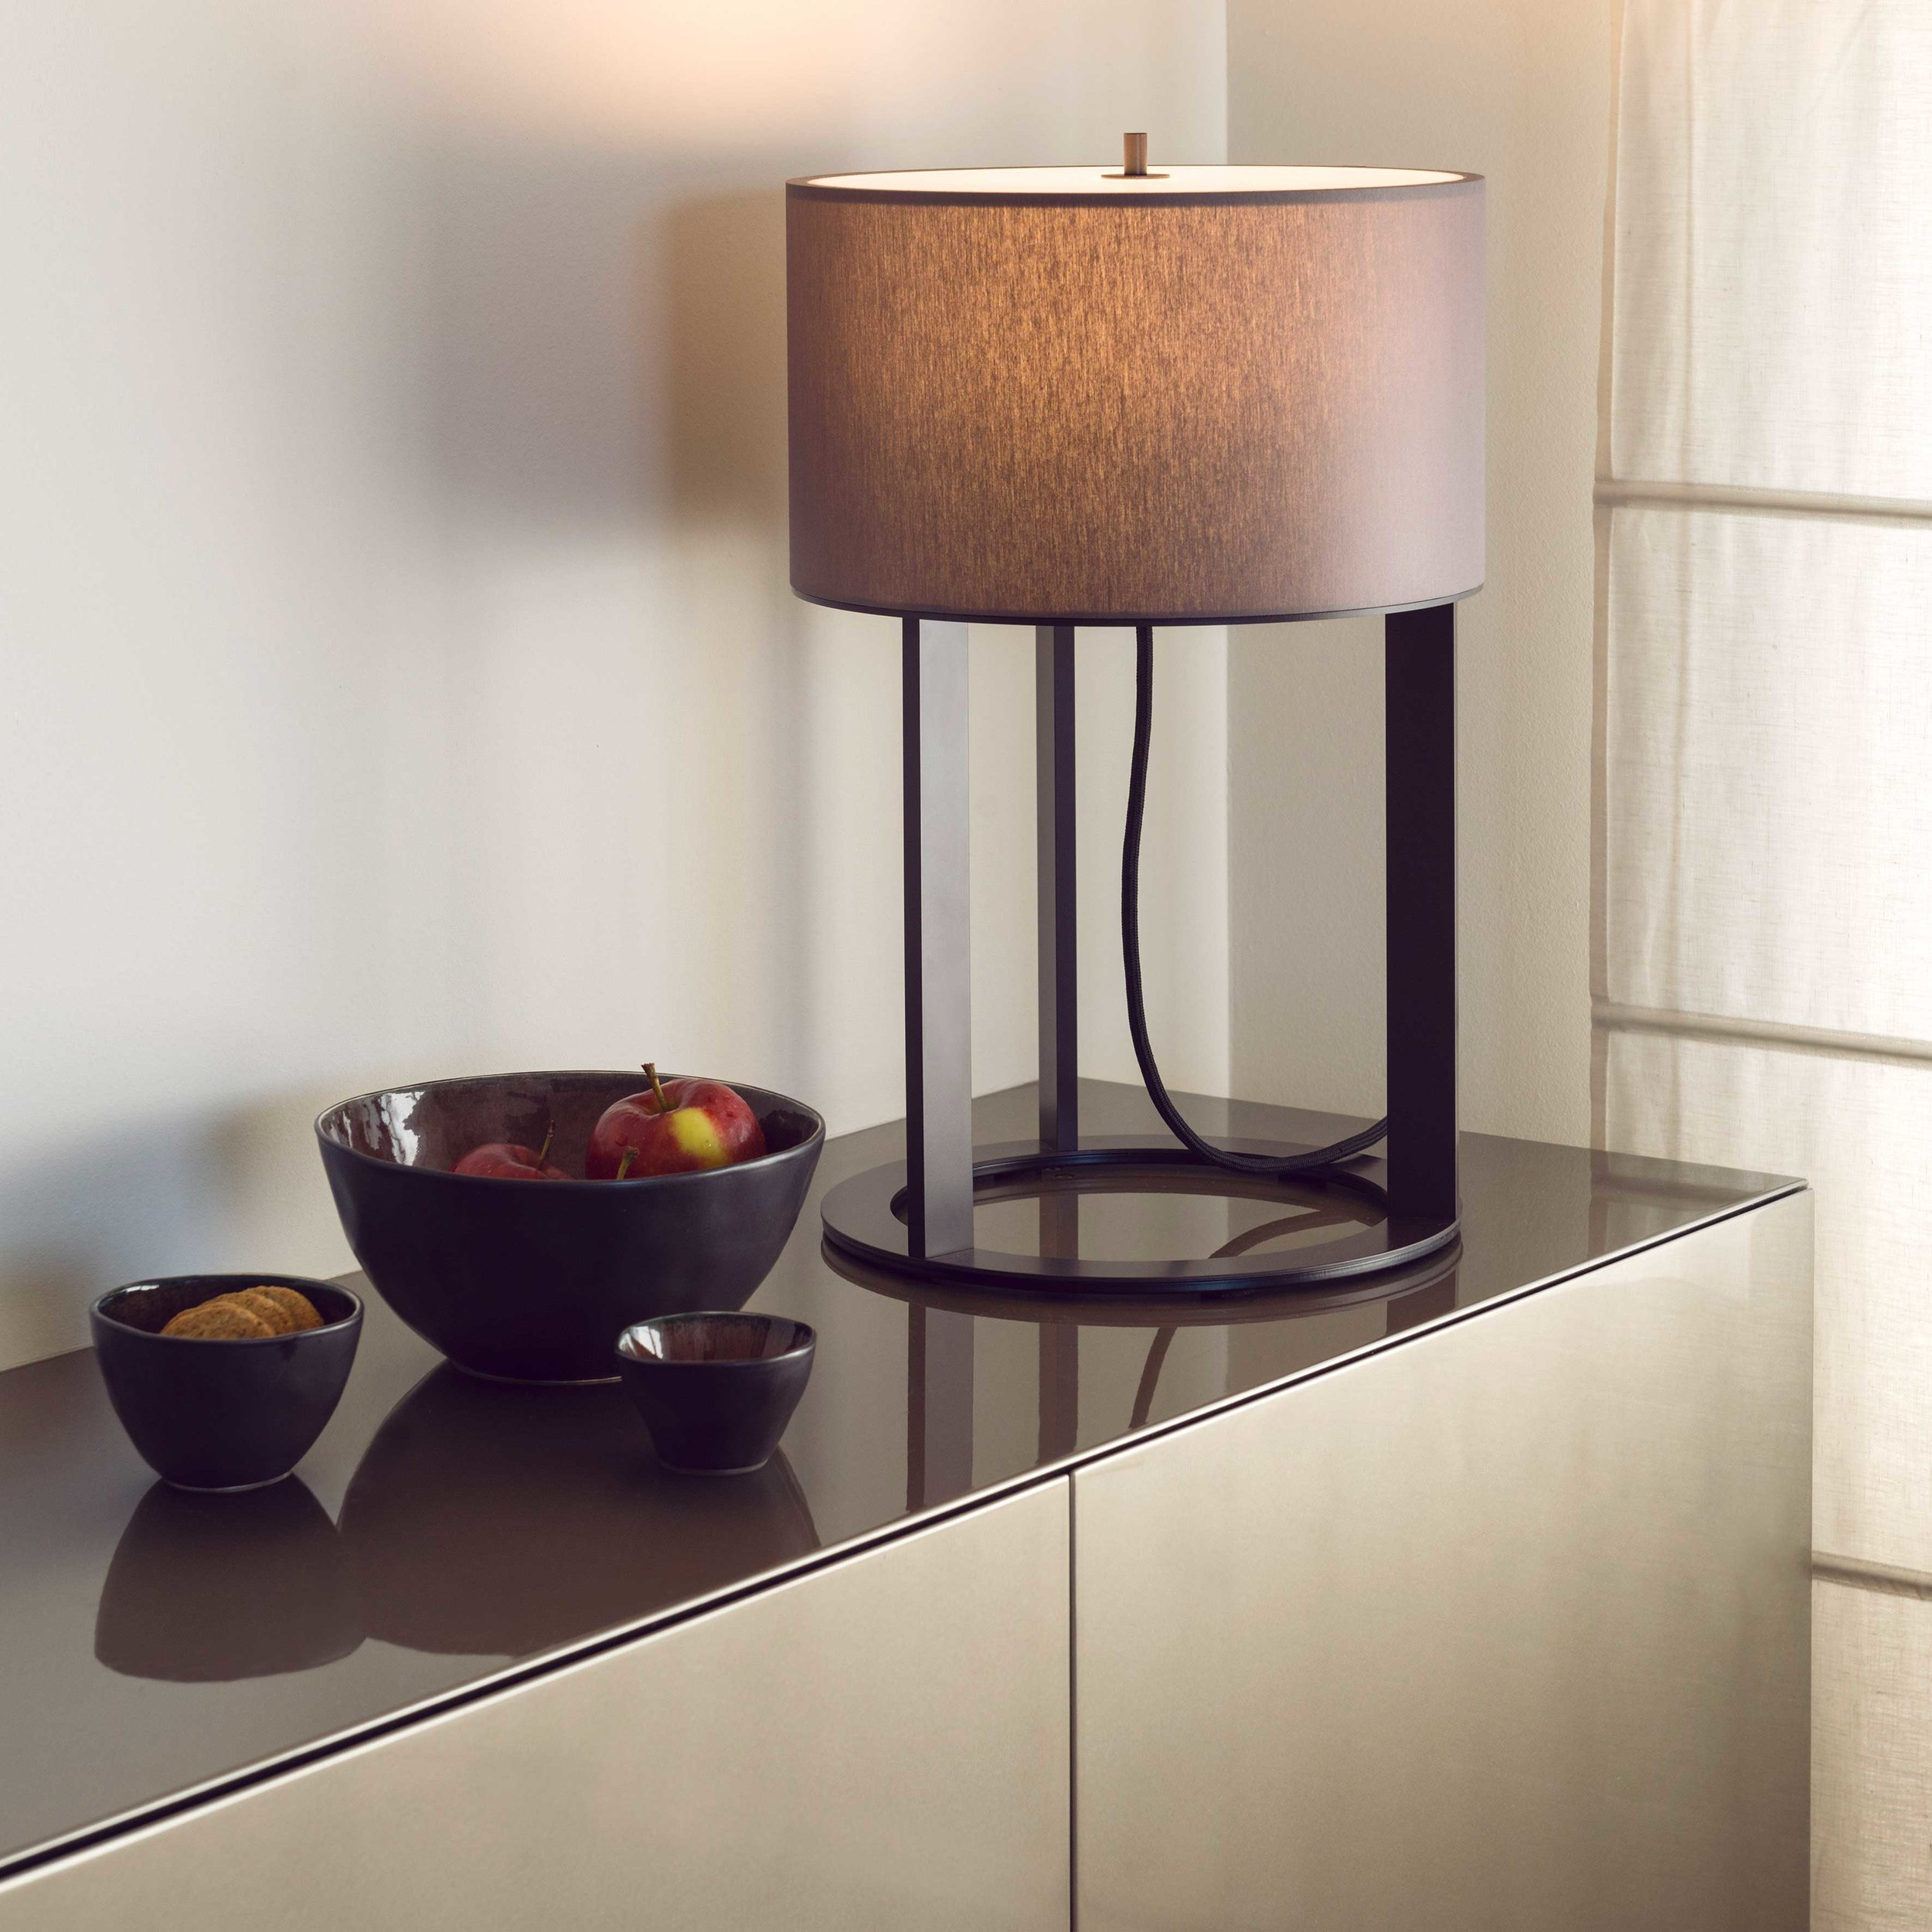 LOE_table_lamp-by-Iria-Degen-Baulmann-Leuchten_01.jpg